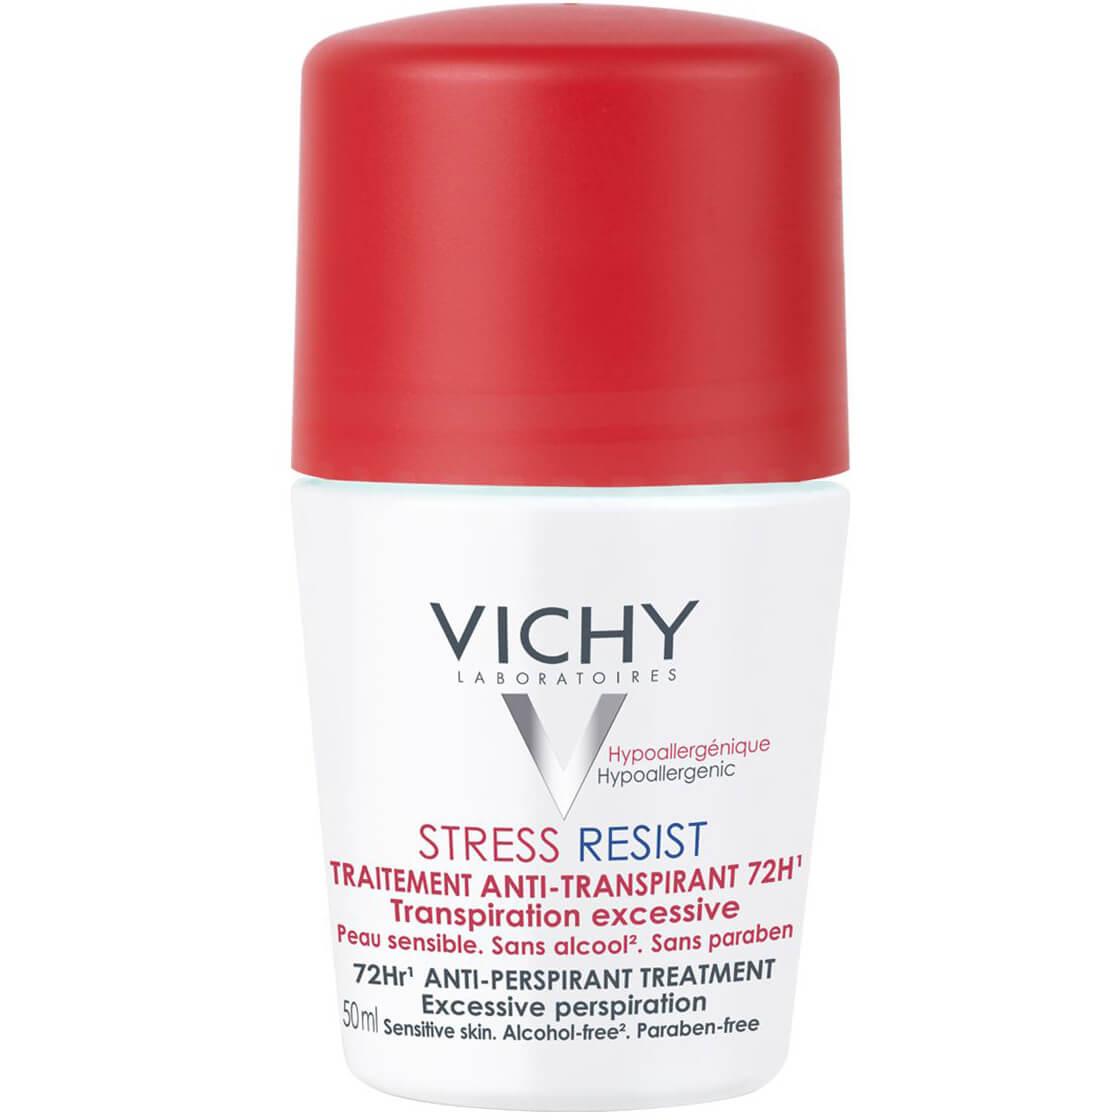 Vichy Deodorant Stress Resist Roll On 72h ΕντατικήΑποσμητικήΦροντίδα 72h Κατά της Έντονης Εφίδρωσης 50ml